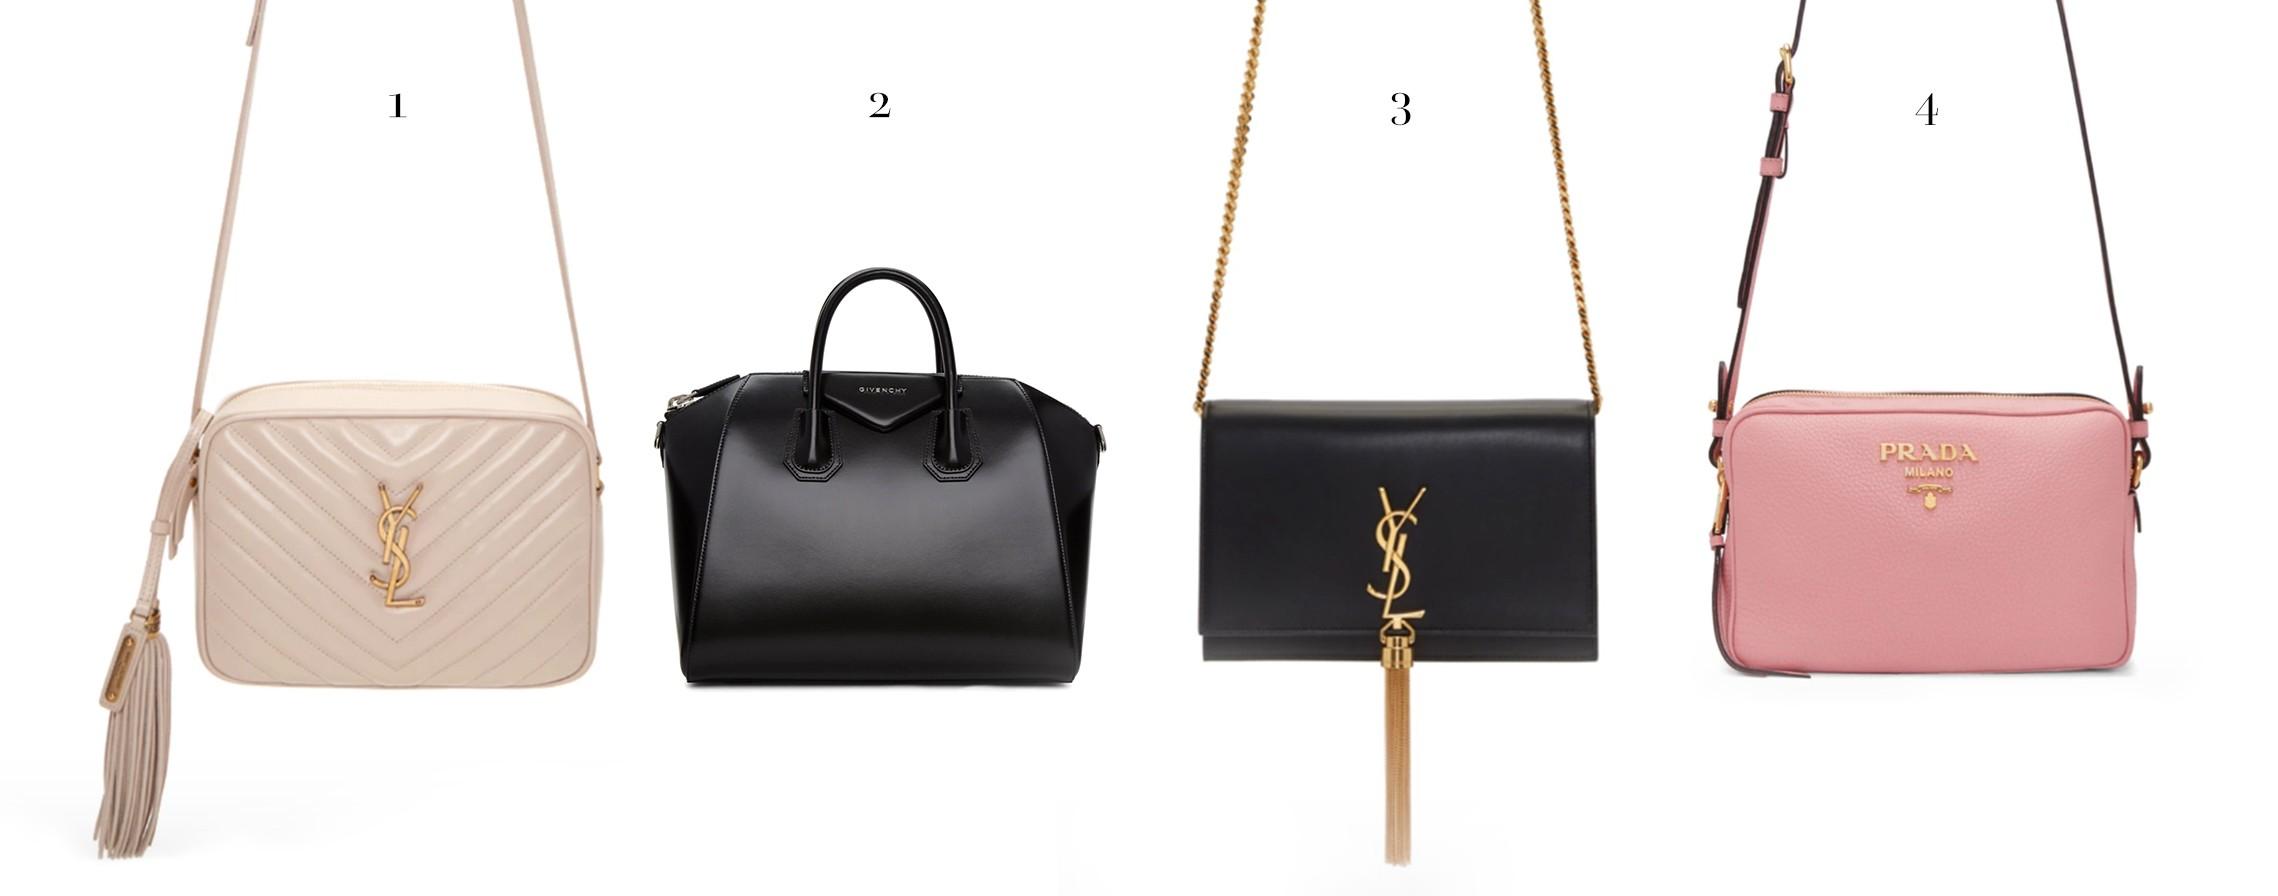 1c335bfadc451c Saint Laurent Lou Camera Bag // 2. Givenchy Antigona // 3. Saint Laurent  Kate Tassel Bag // 4. Prada Pink Crossbody